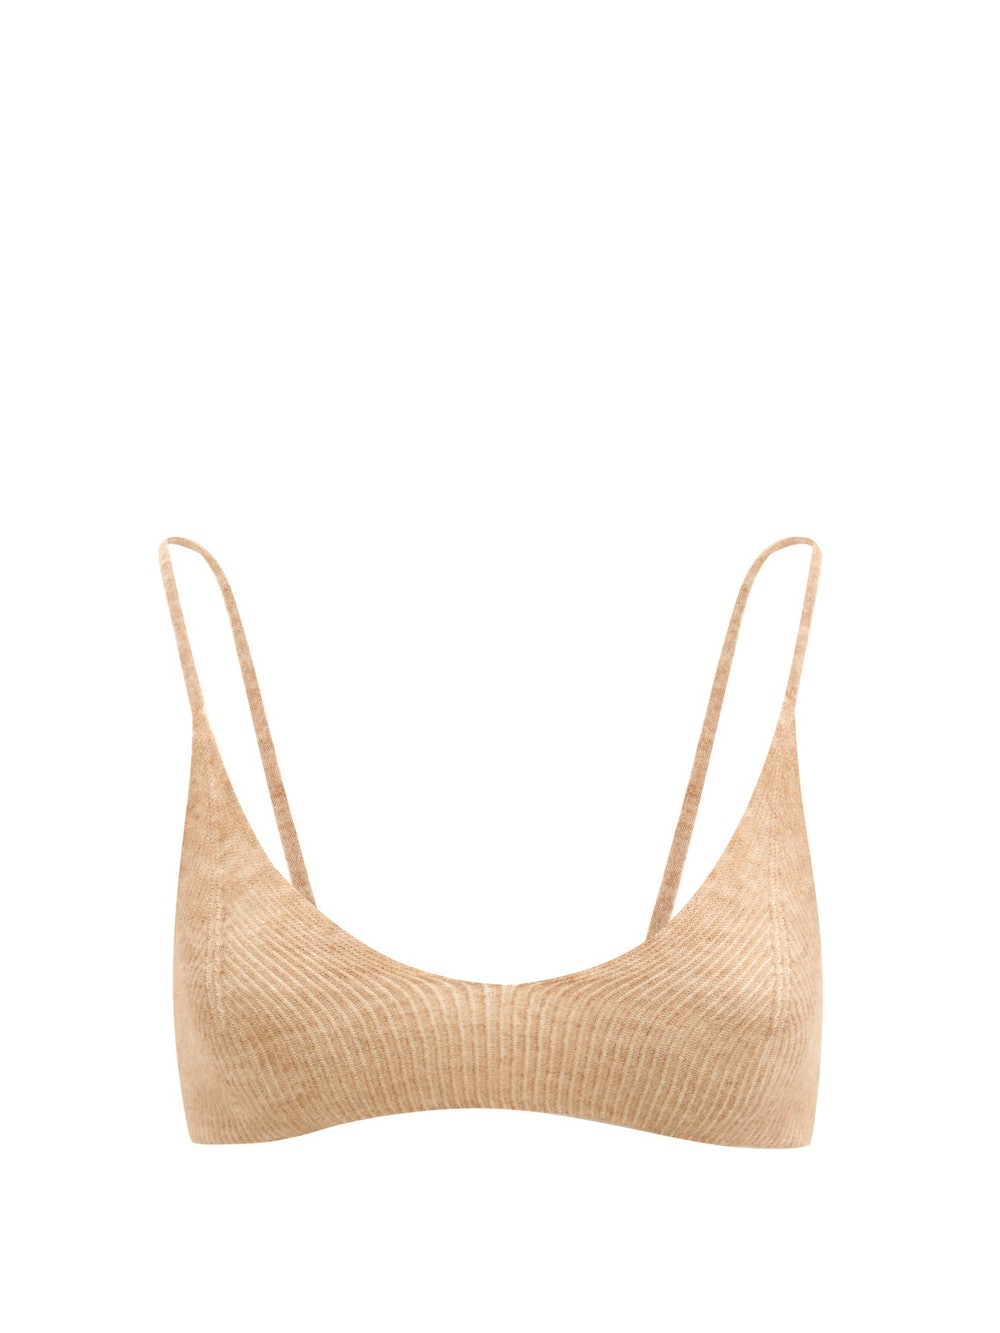 Valensole V-neck rib-knitted bra top